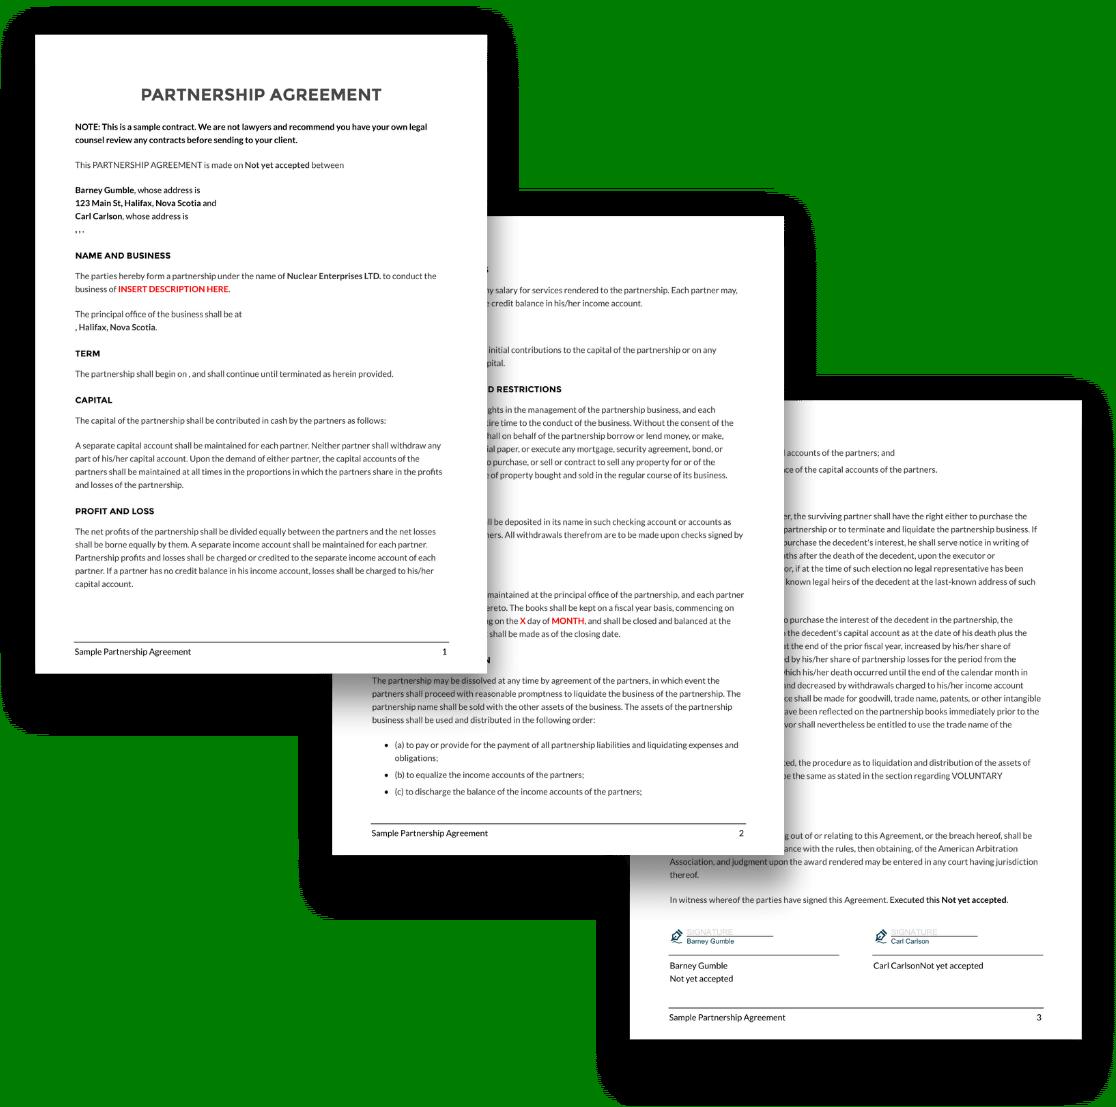 Partnership agreement template spread